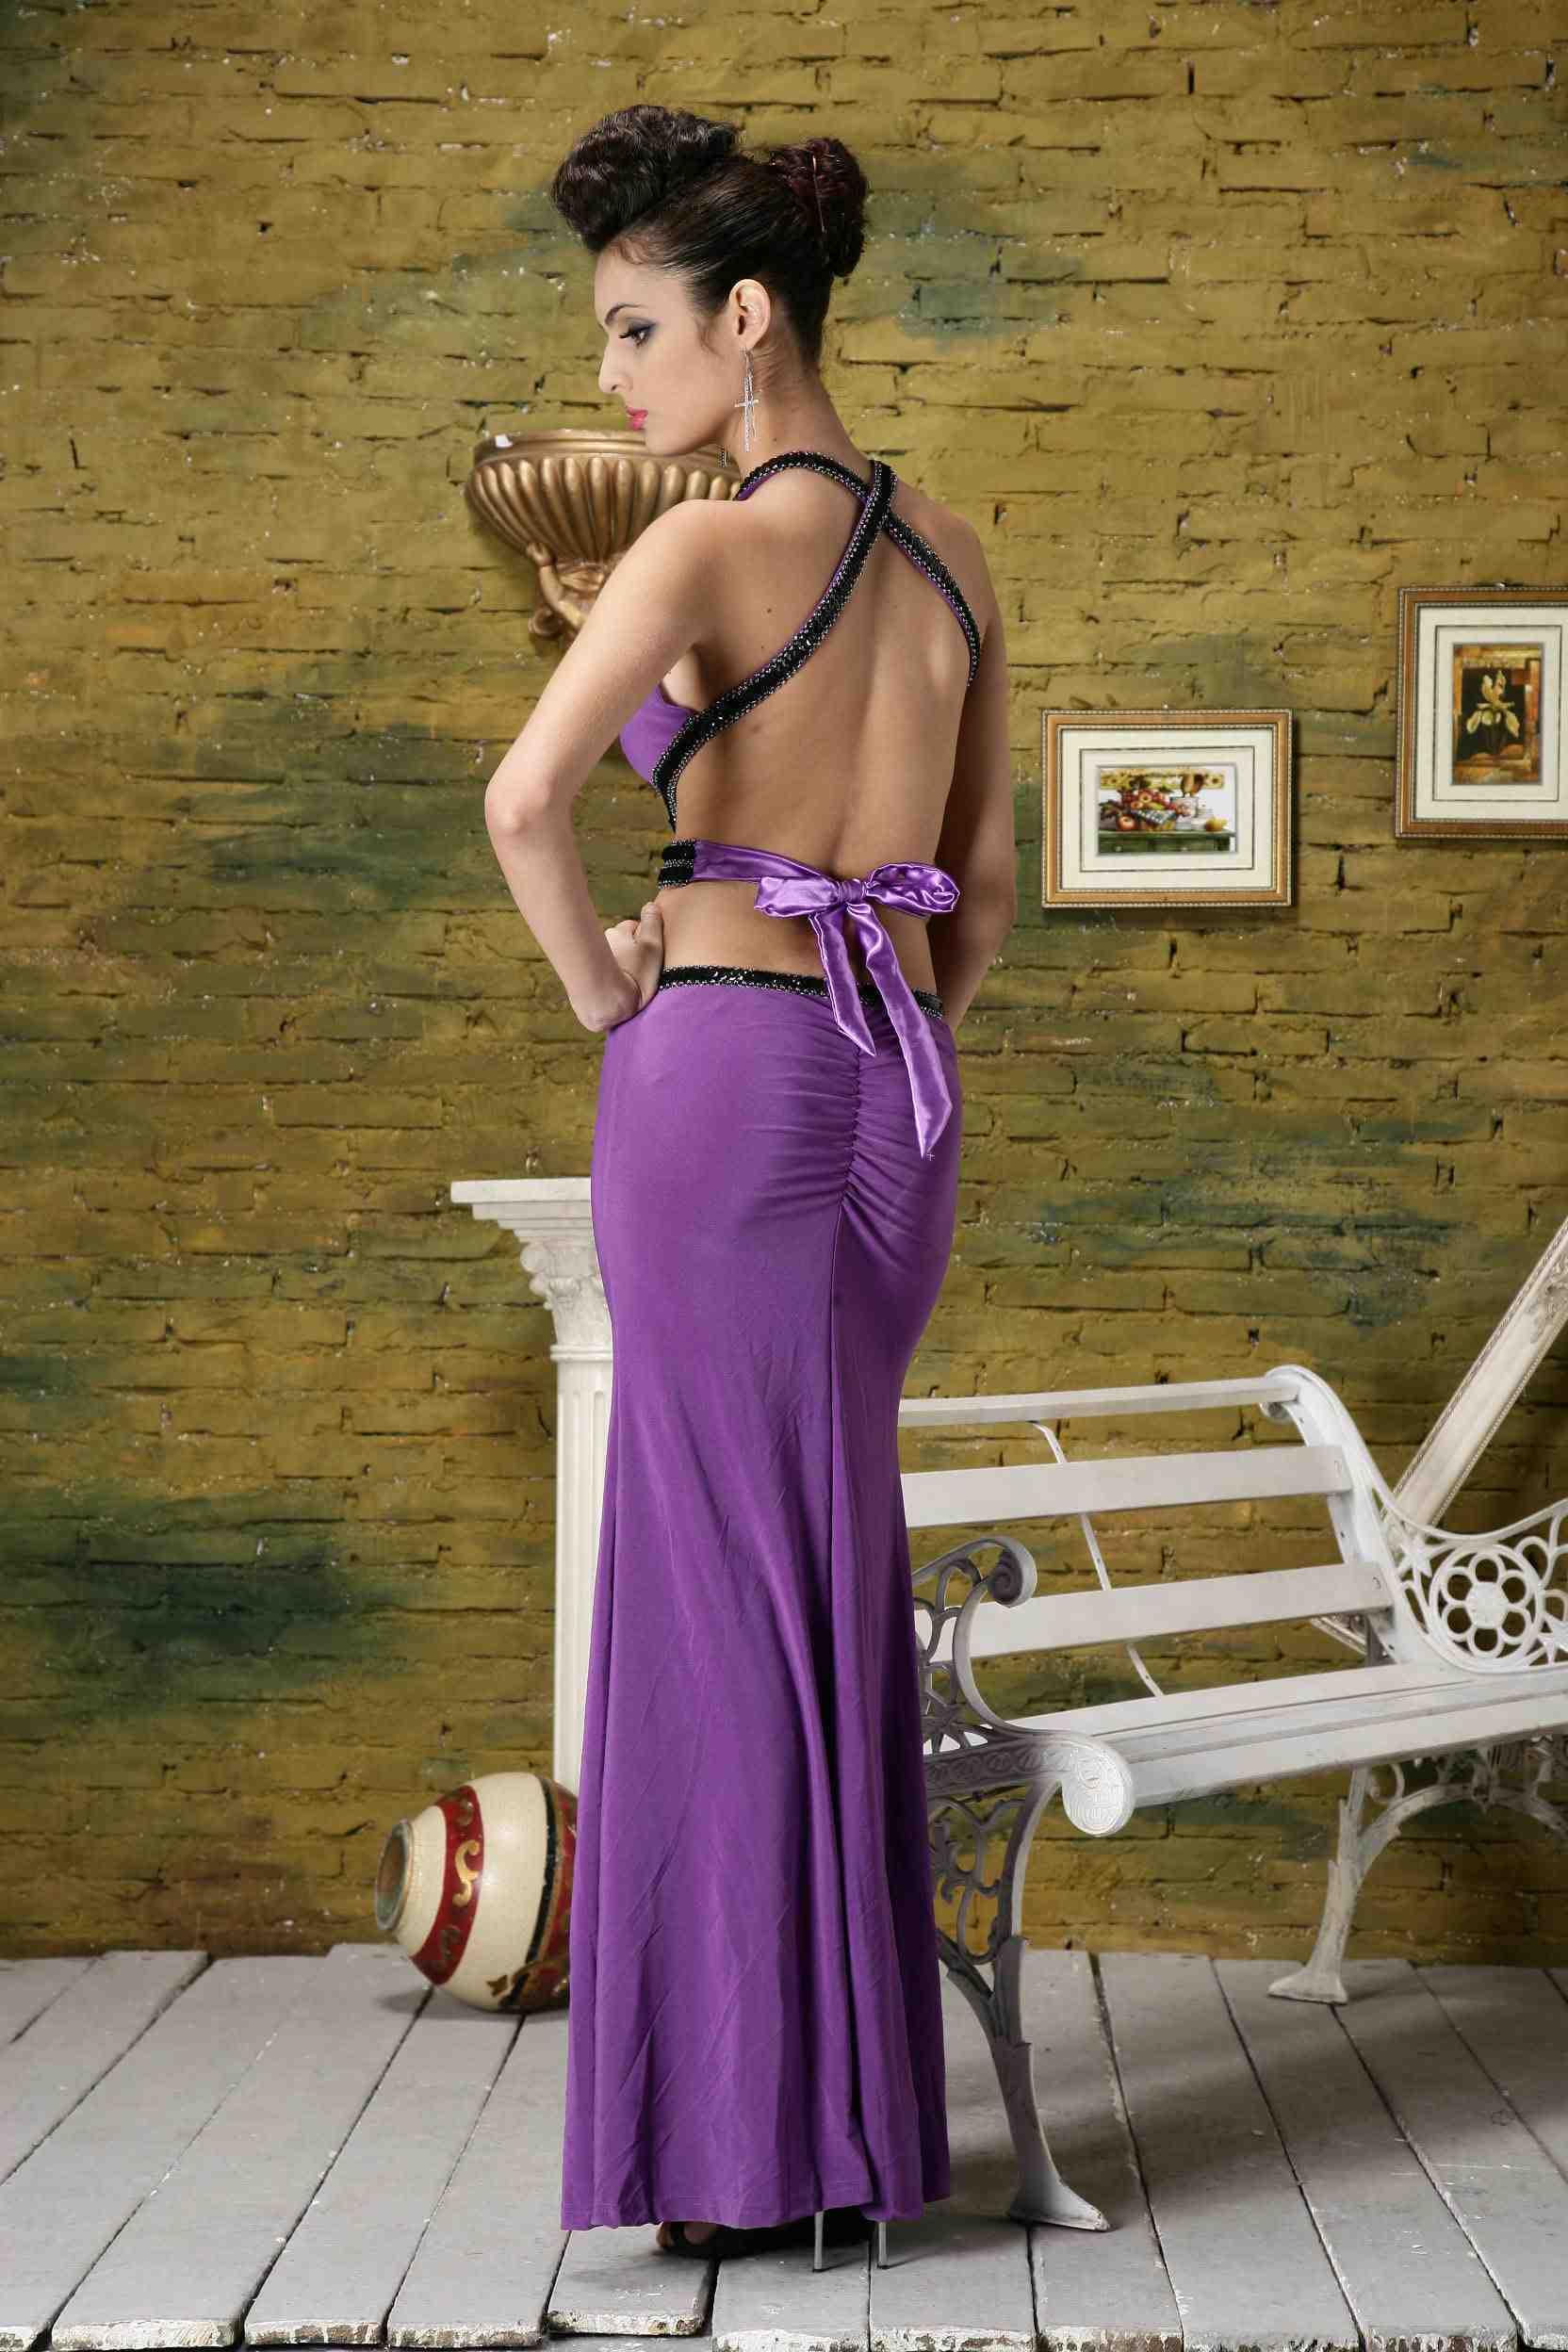 Вечернее платье Lan Kwai Fong 21250 Lan Kwai Fong 2013 года Макси-юбка (более 126см)